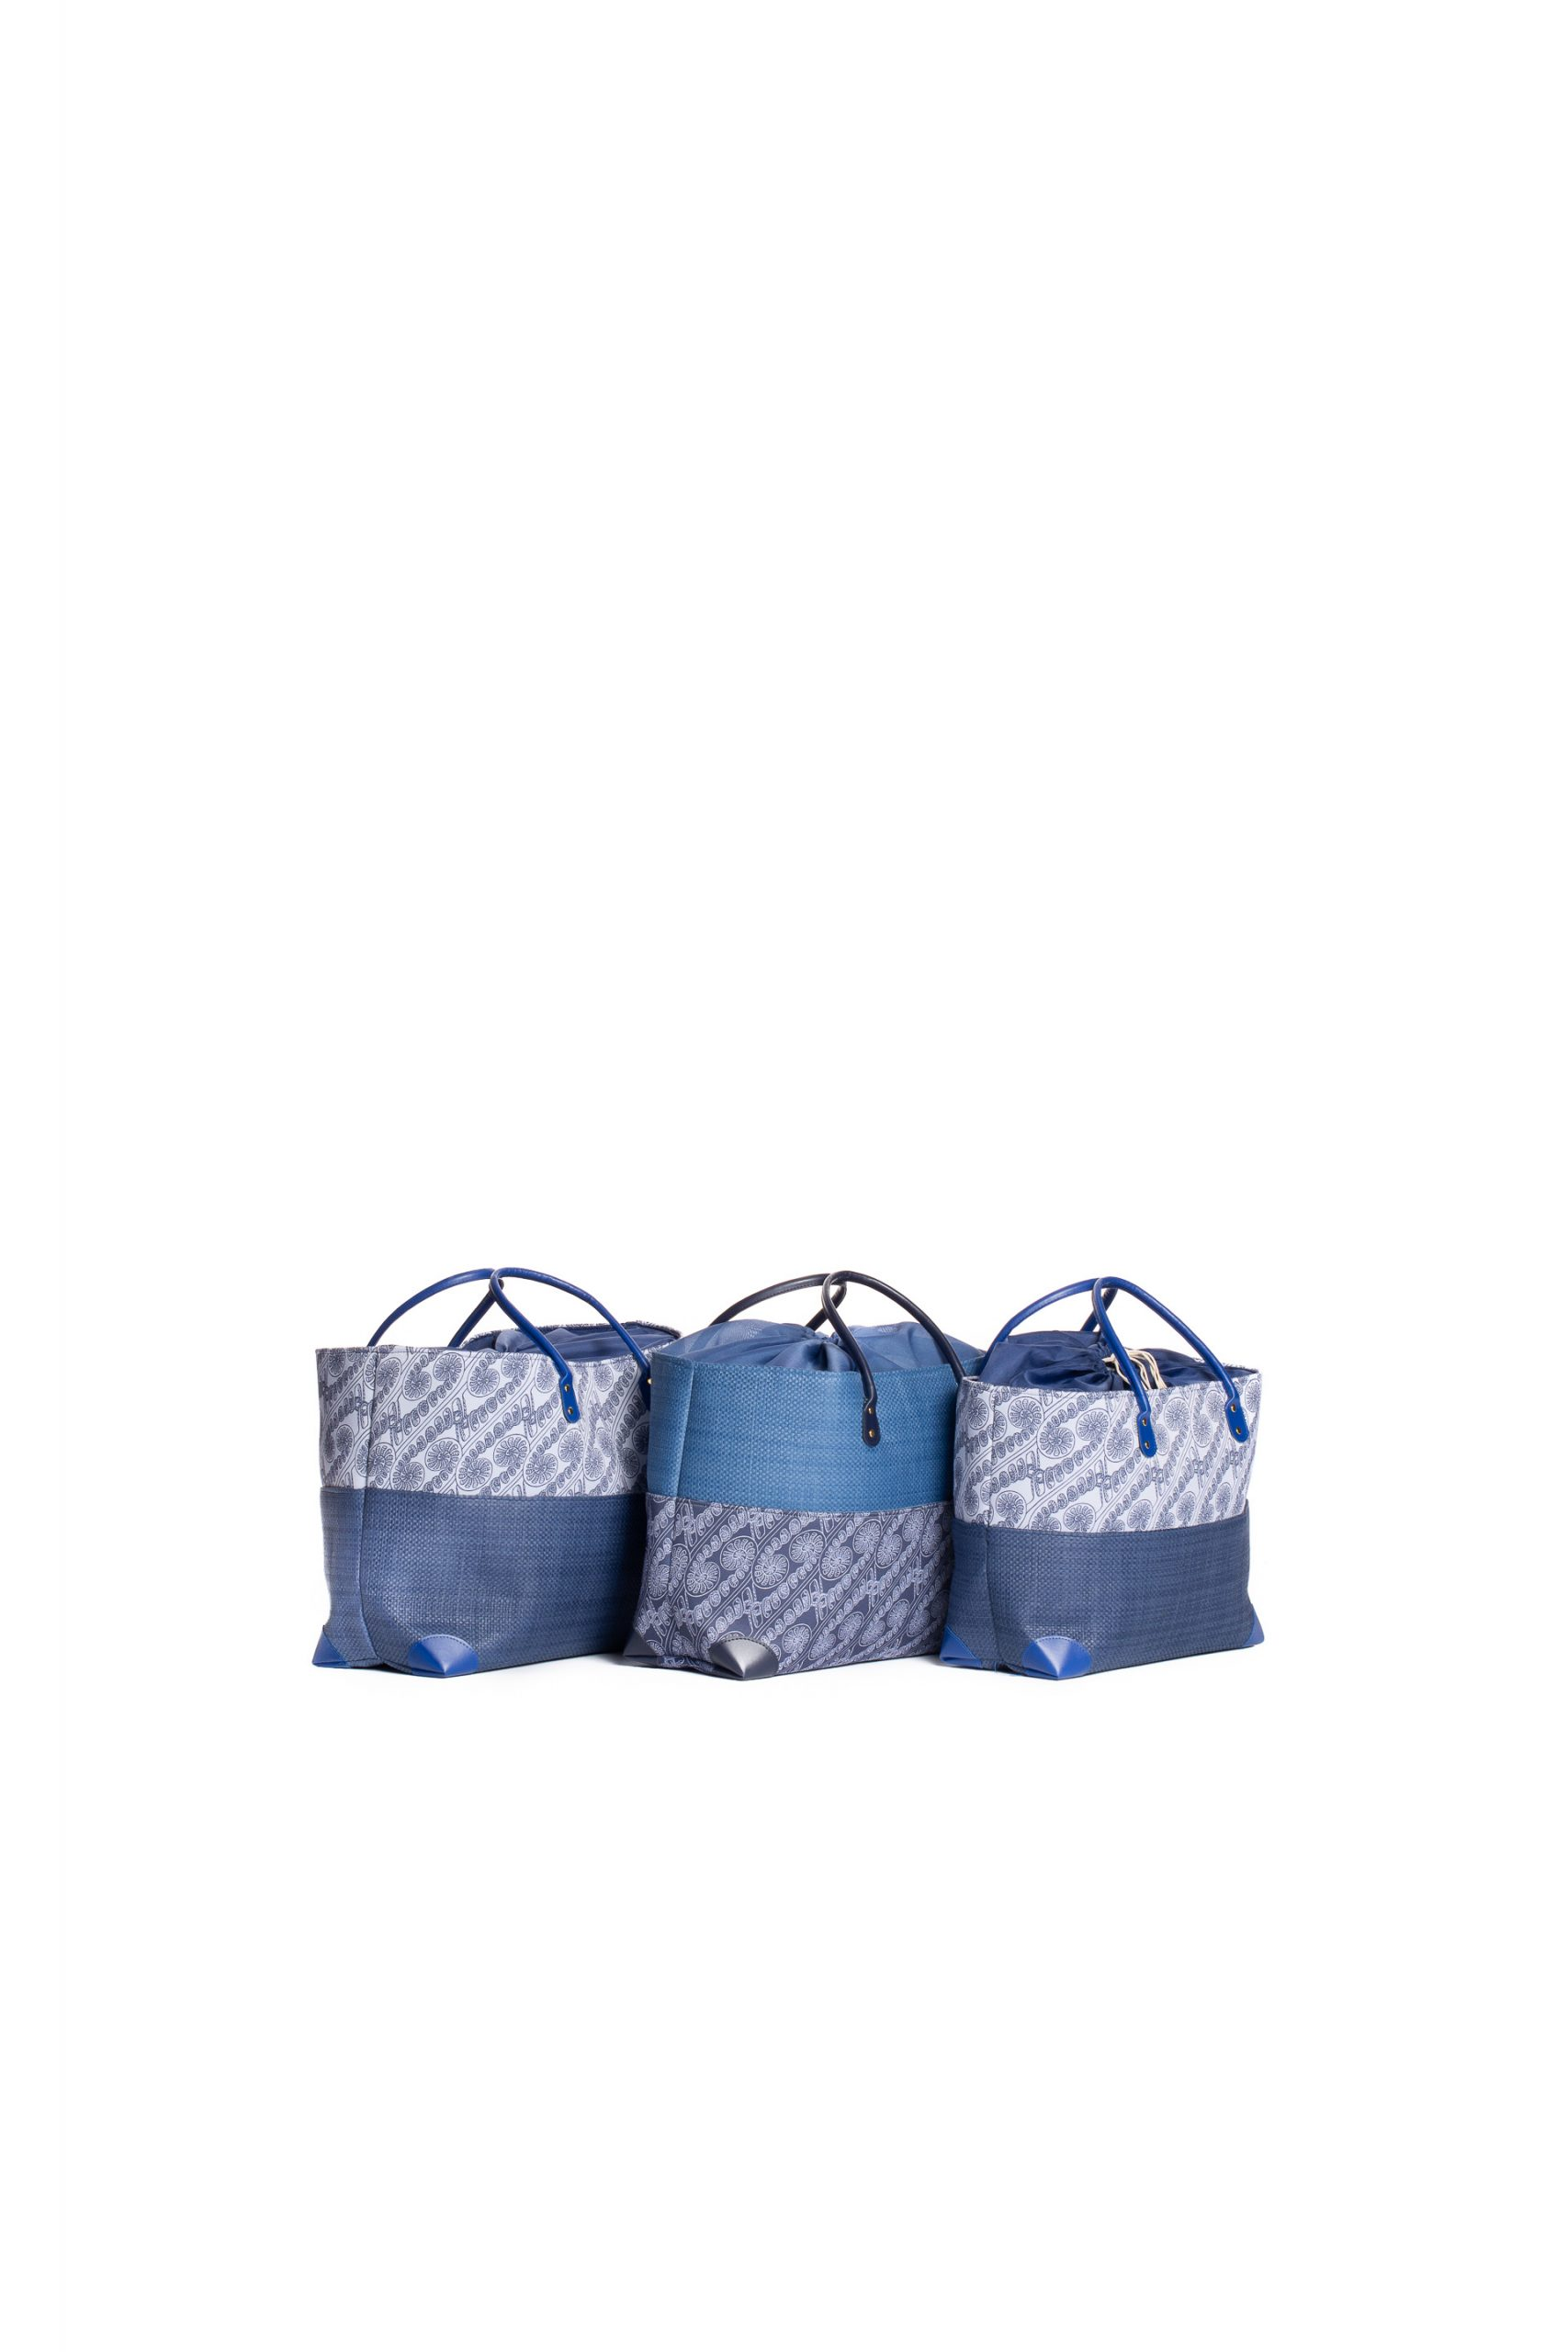 Hula Trio Bag Set in Blue